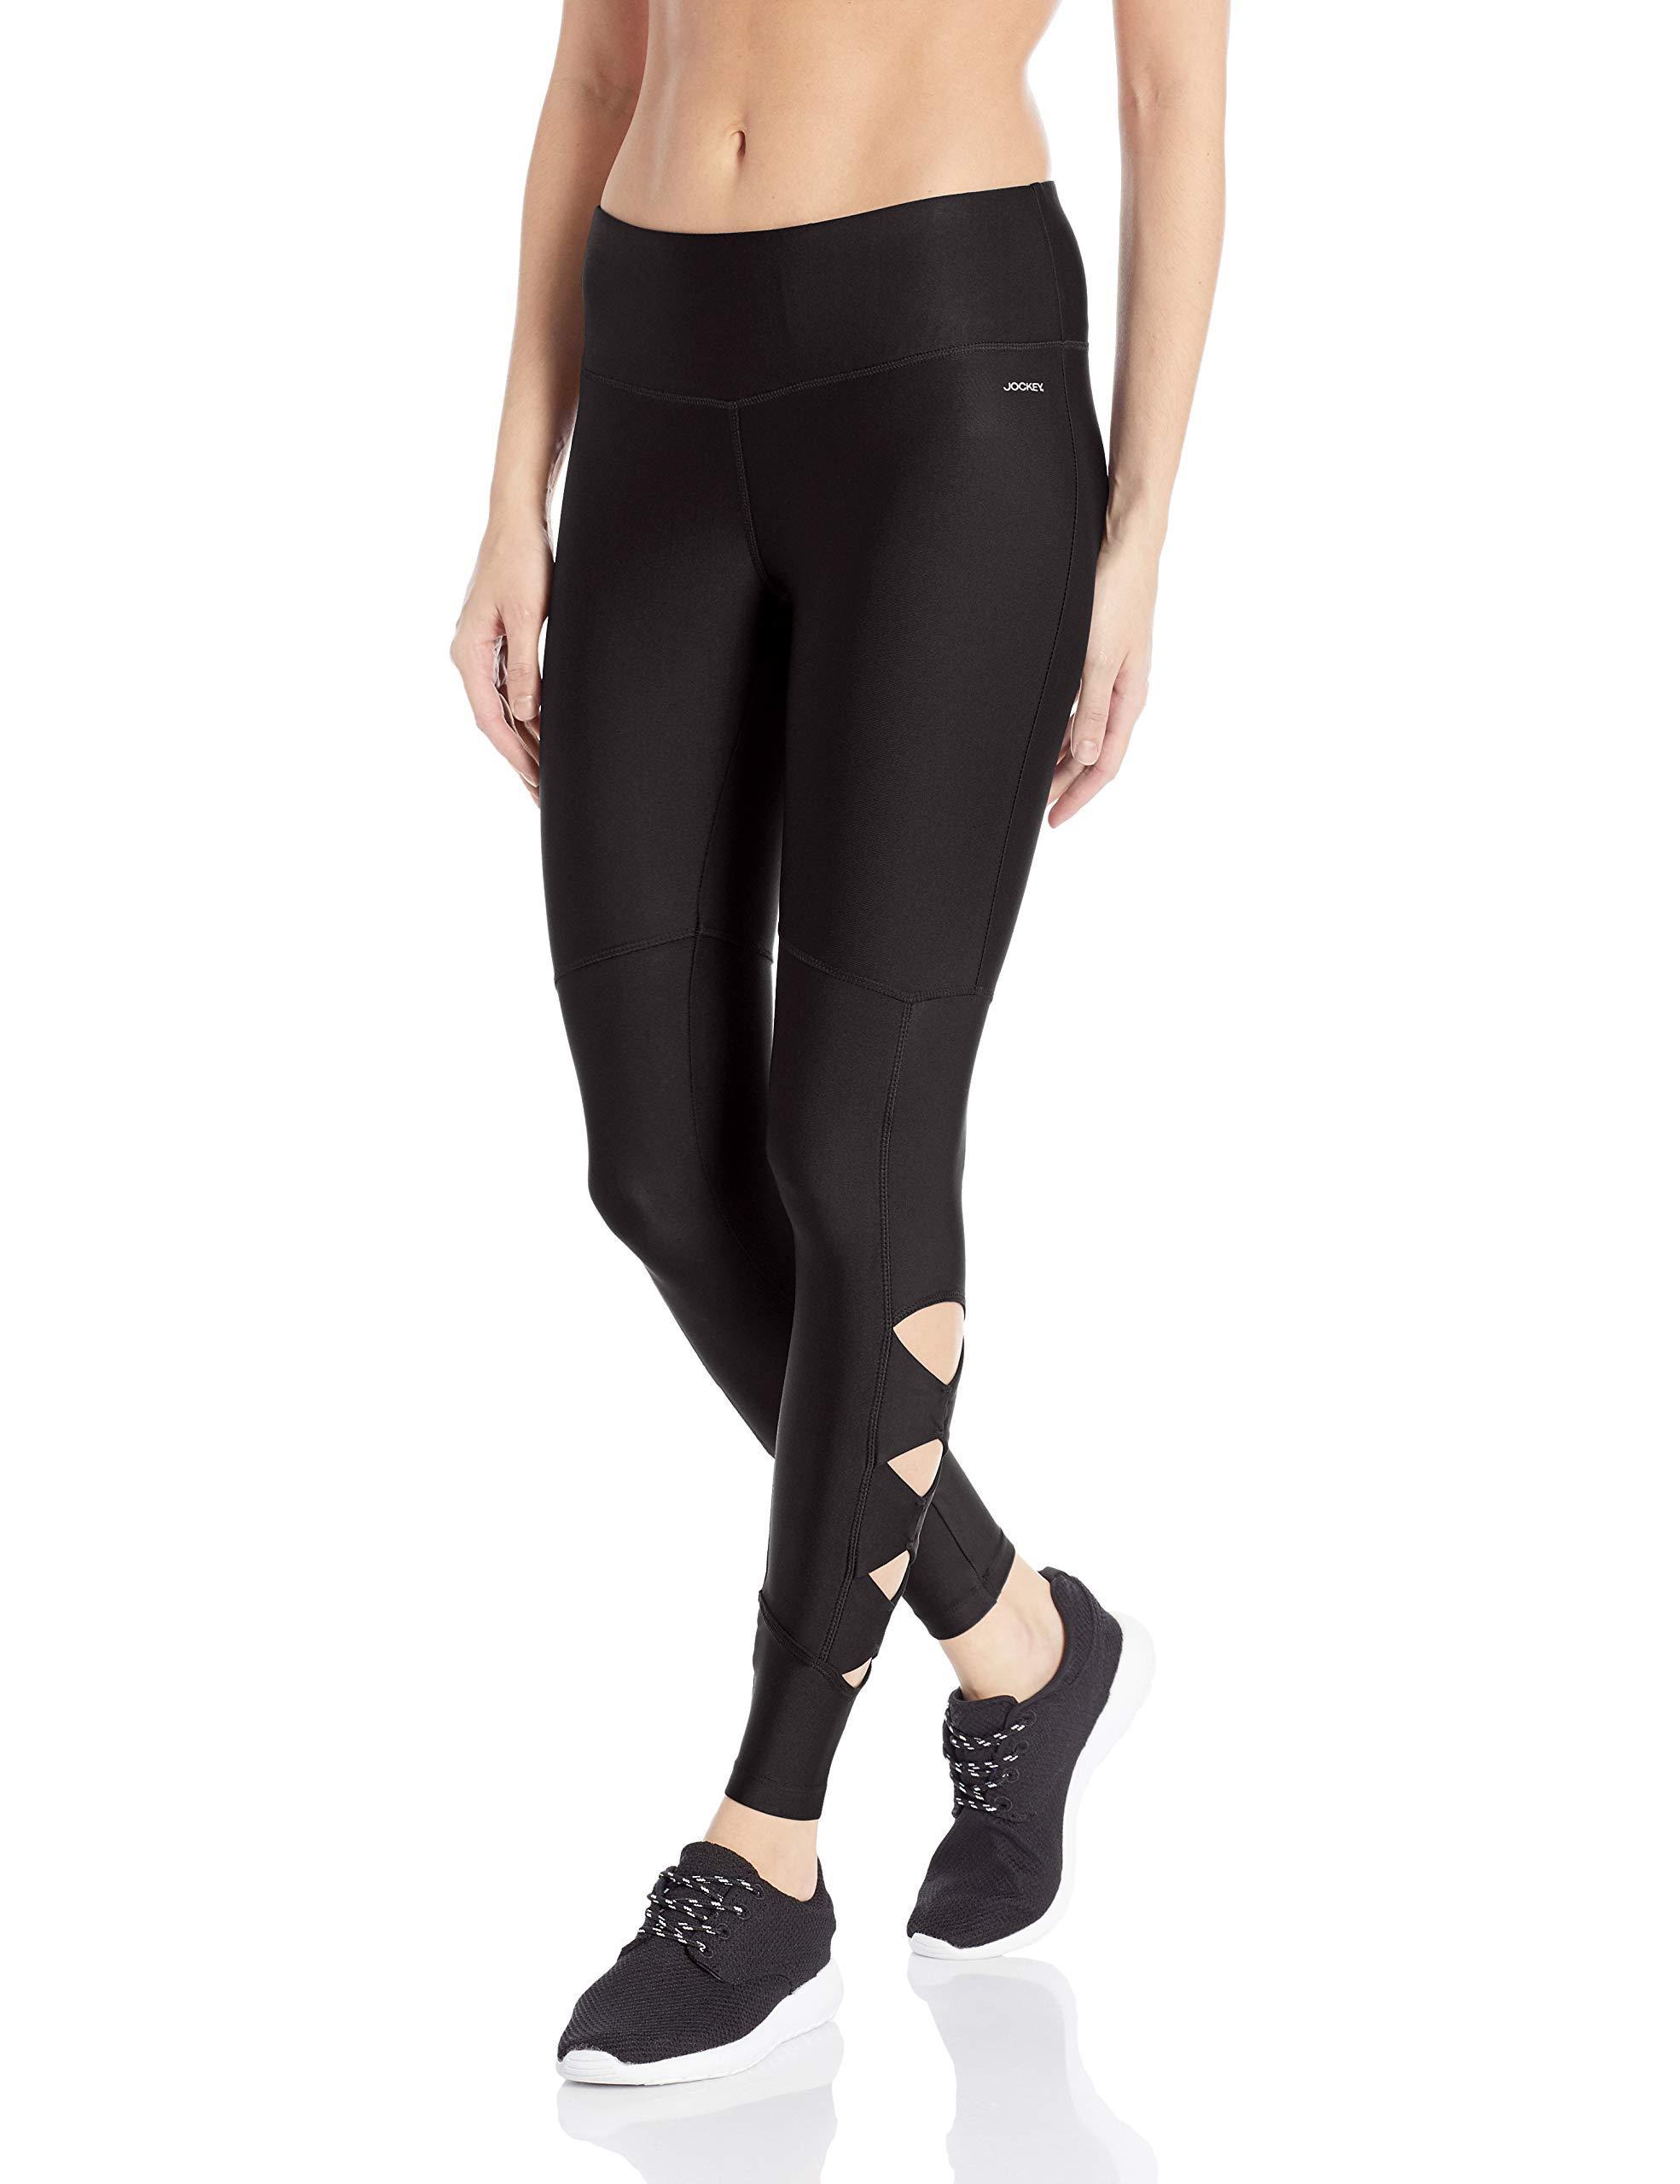 Jockey Womens Activewear Mesh Ankle Legging